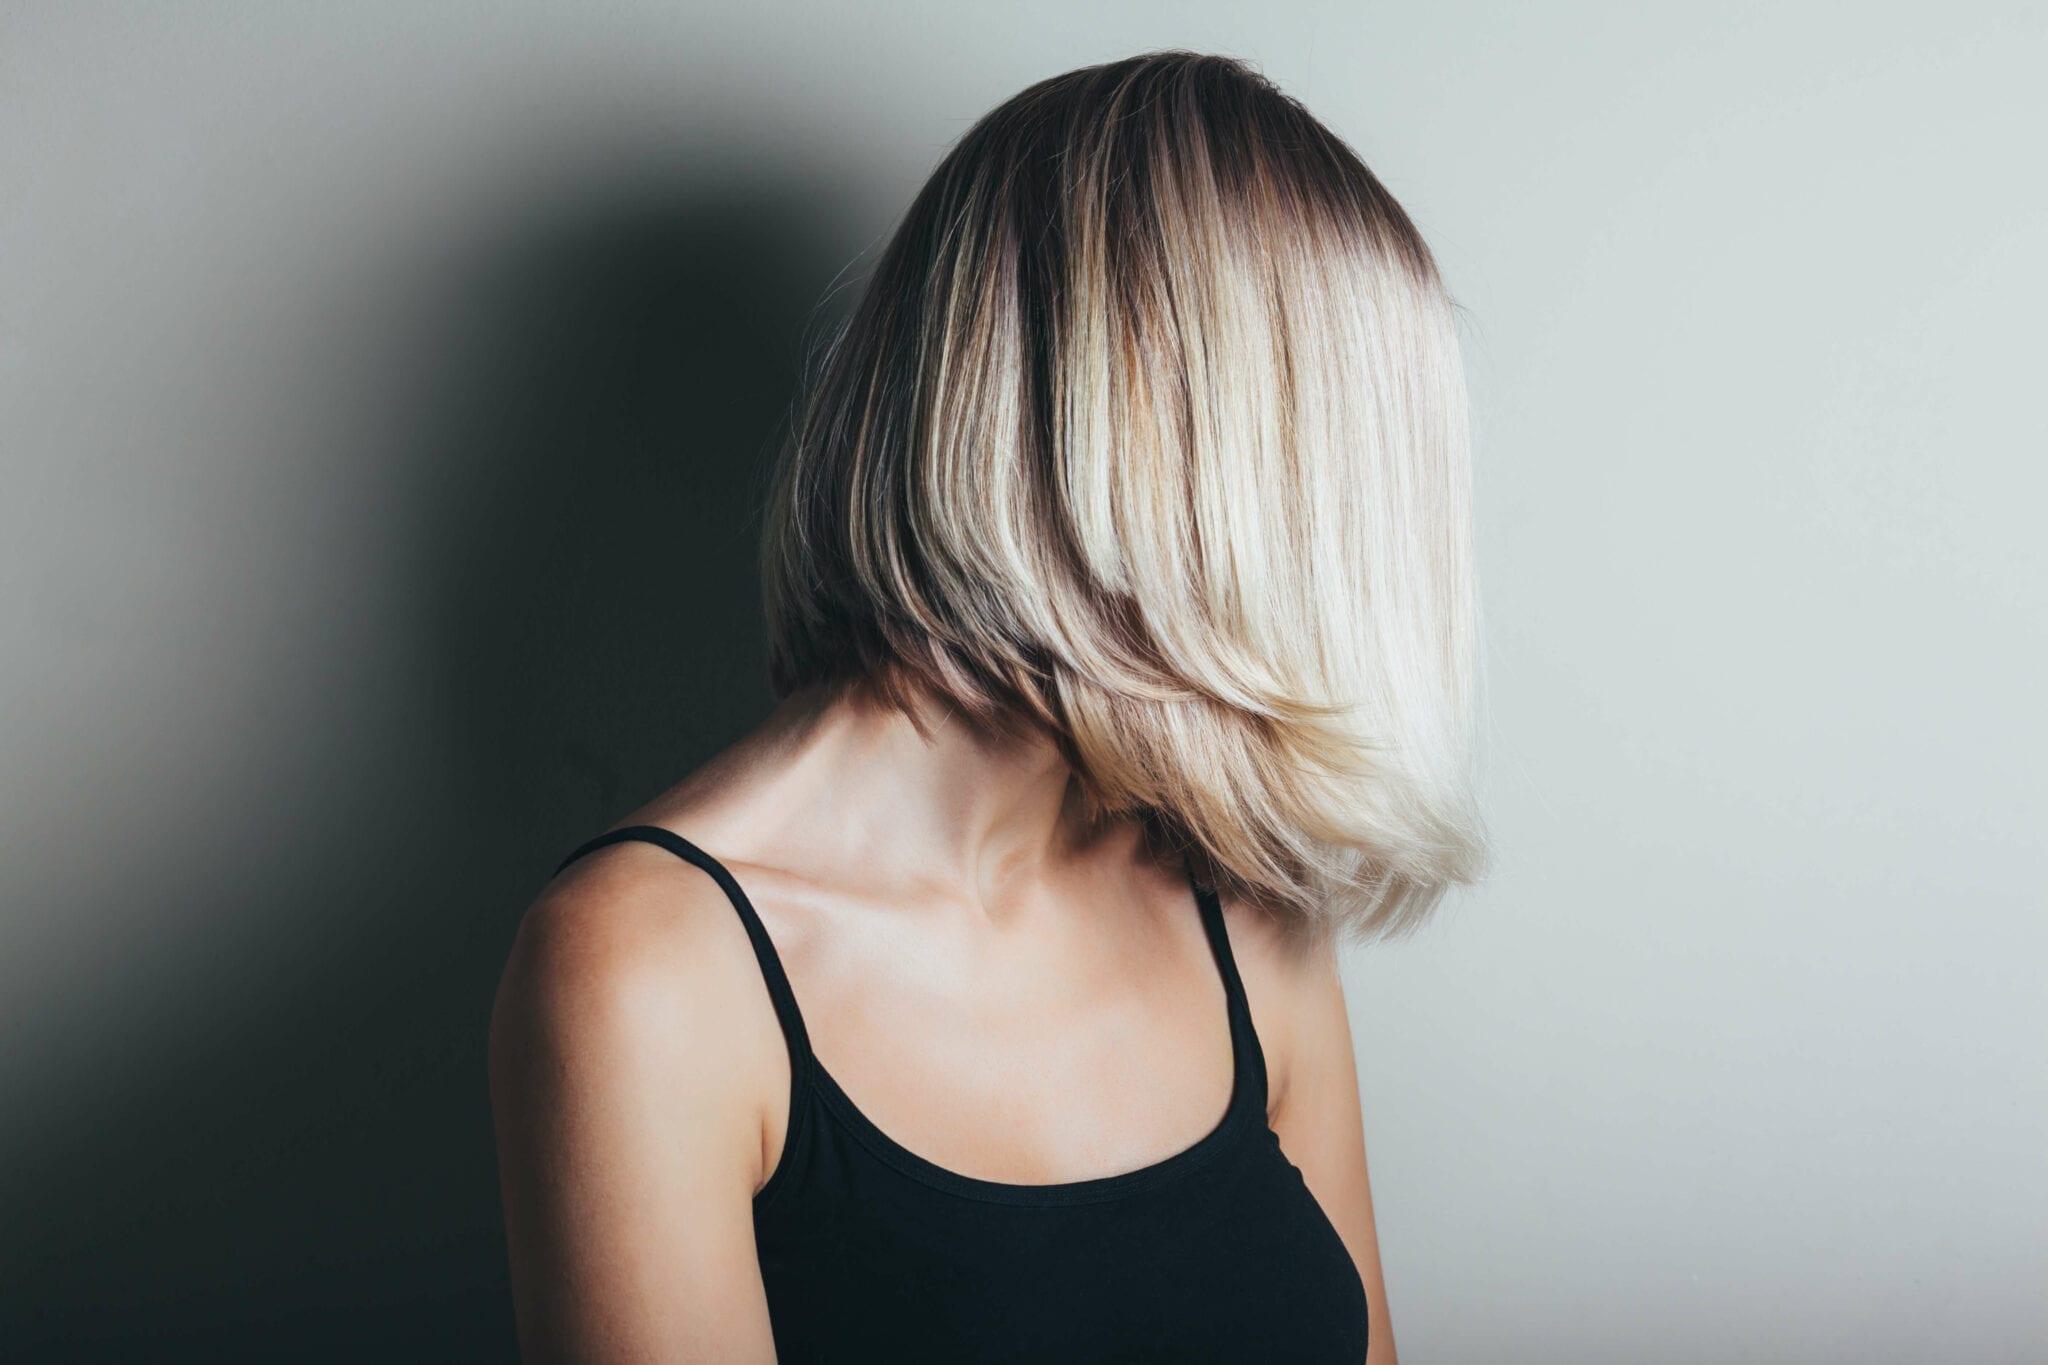 Home bliss hair studio kool kuts pmusecretfo Image collections